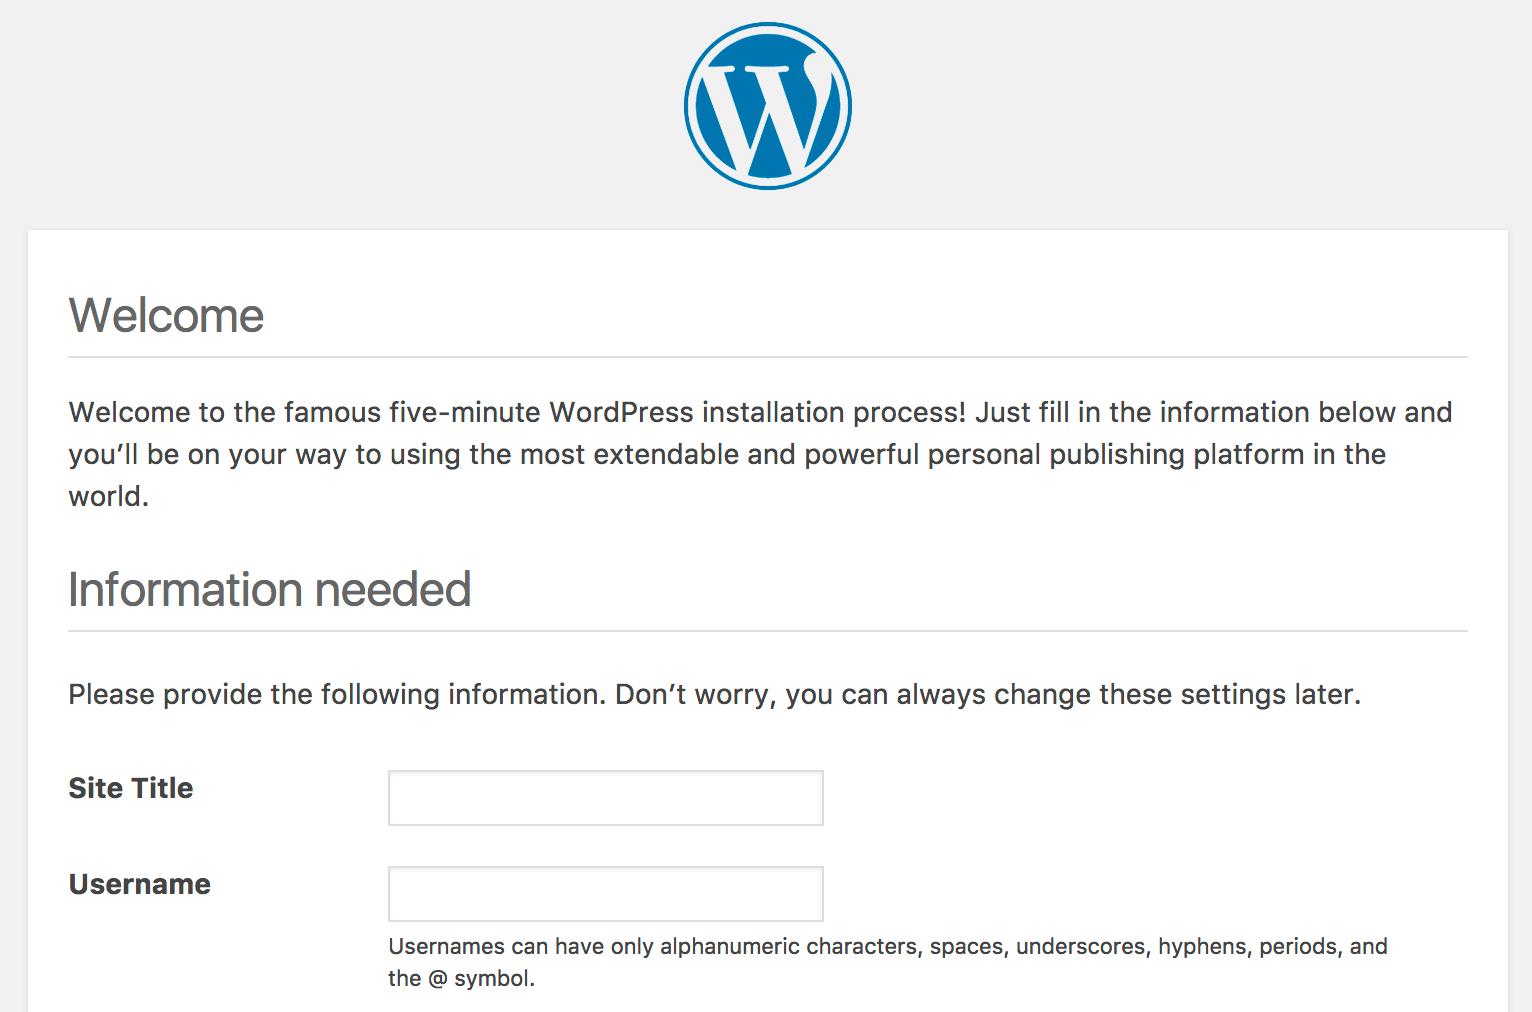 Processus d'installation WordPress